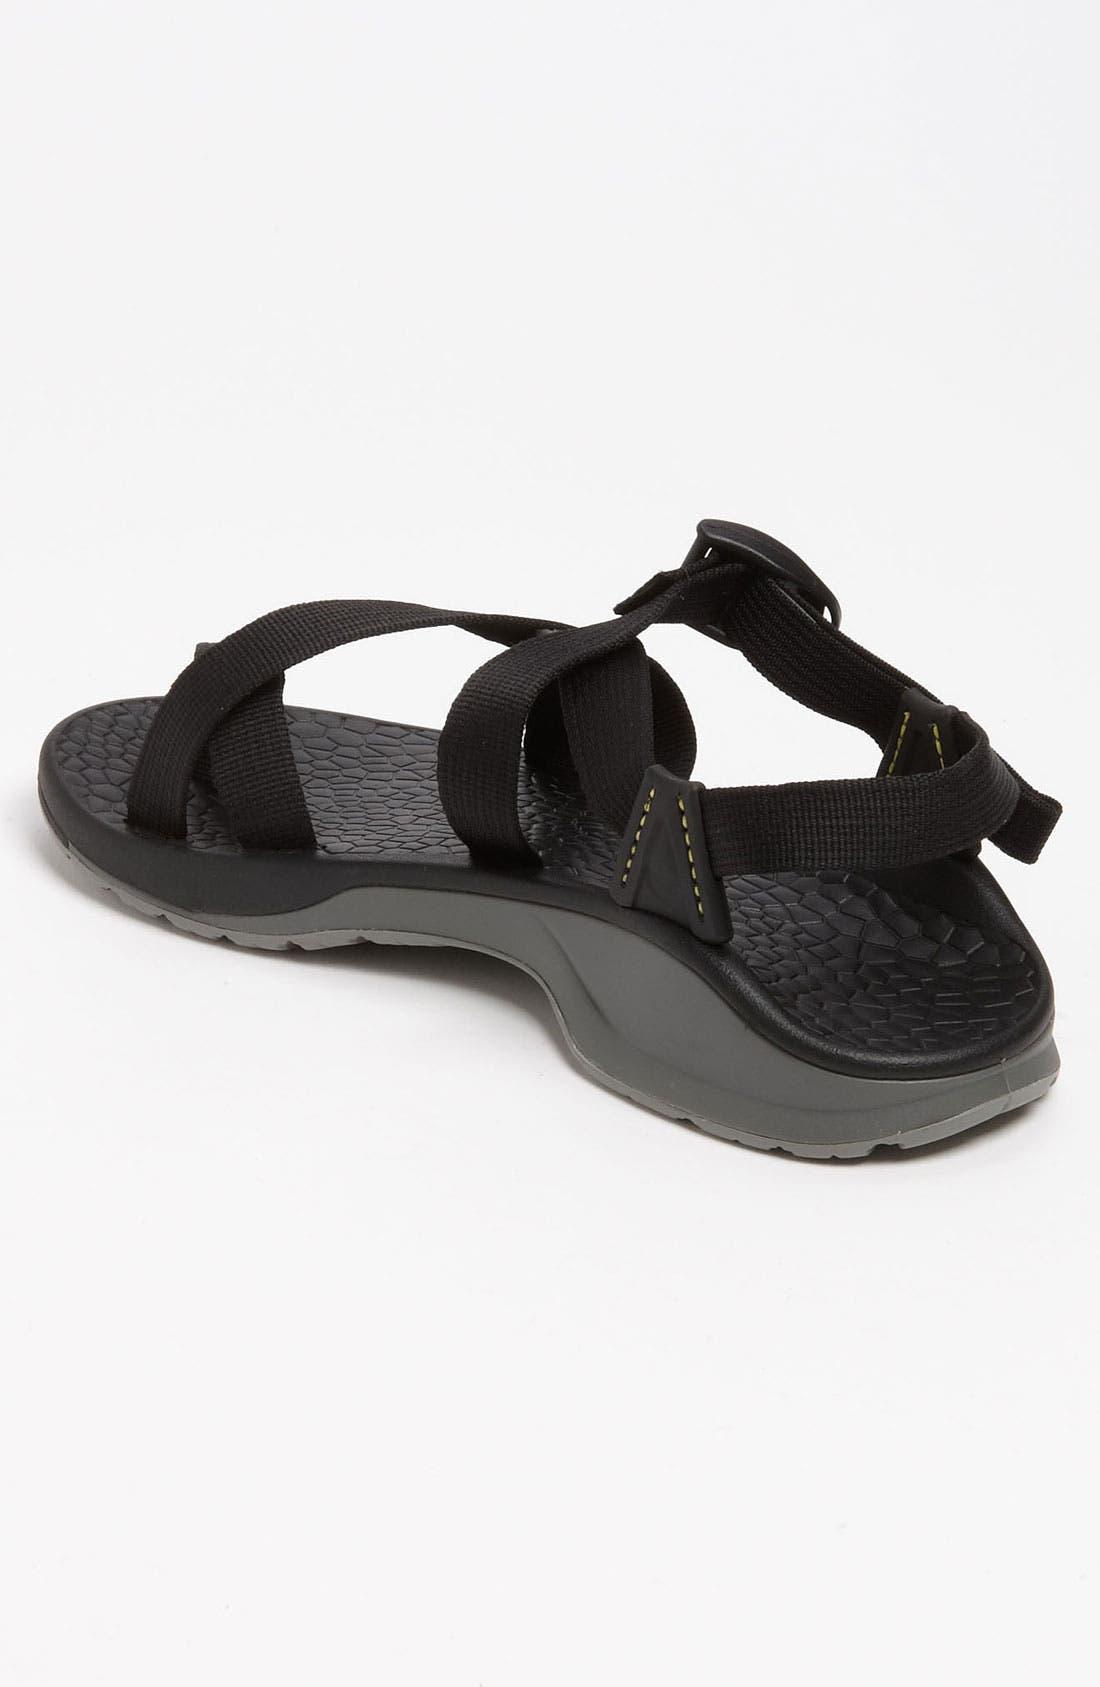 Alternate Image 2  - Chaco 'Updraft 2' Sandal